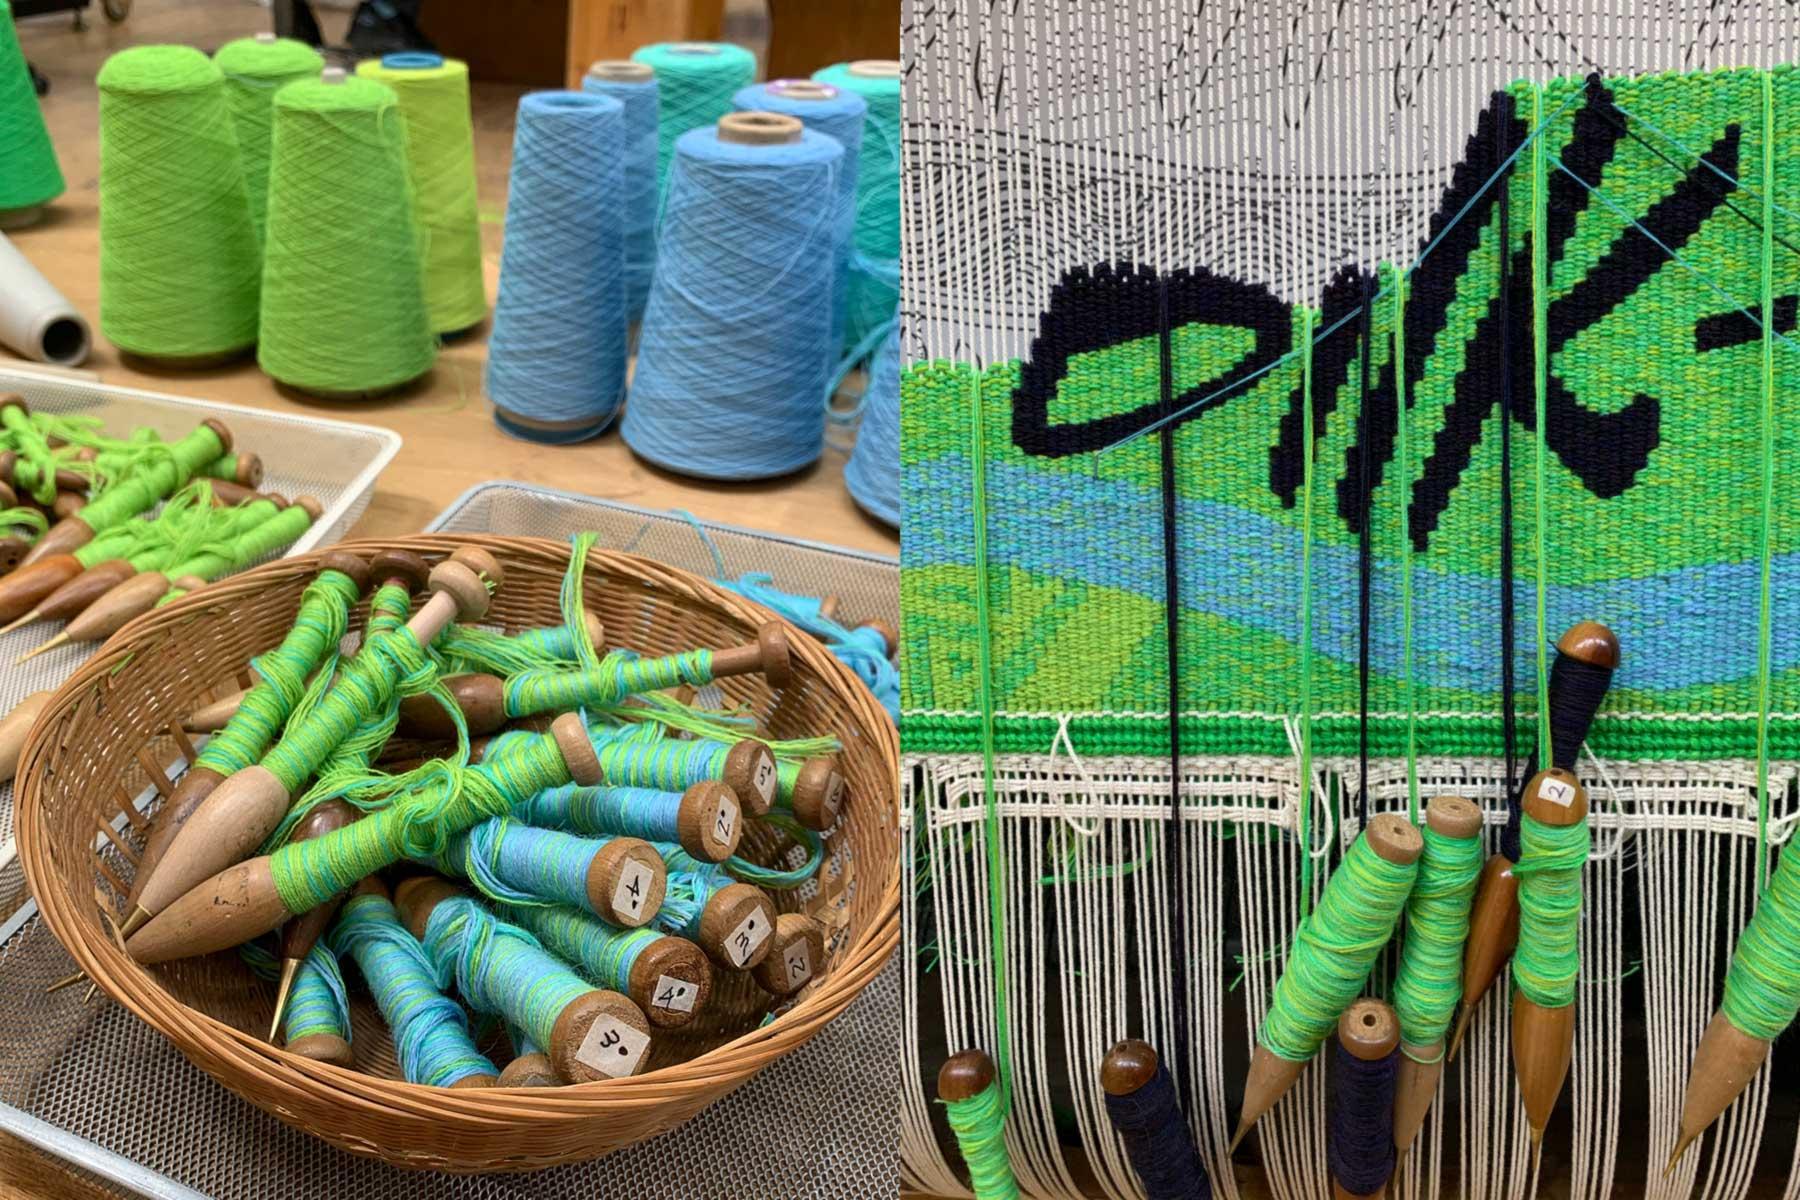 Left to right, bobbins and tapestry in progress: 'Wurundjeri Biik, yalinguth, yalingbu, yirramboi' 2020, Mandy Nicholson, woven by Chris Cochius, Amy Cornall, Cheryl Thornton, 0.58 x 4.32 m, wool, cotton. Photos: ATW.